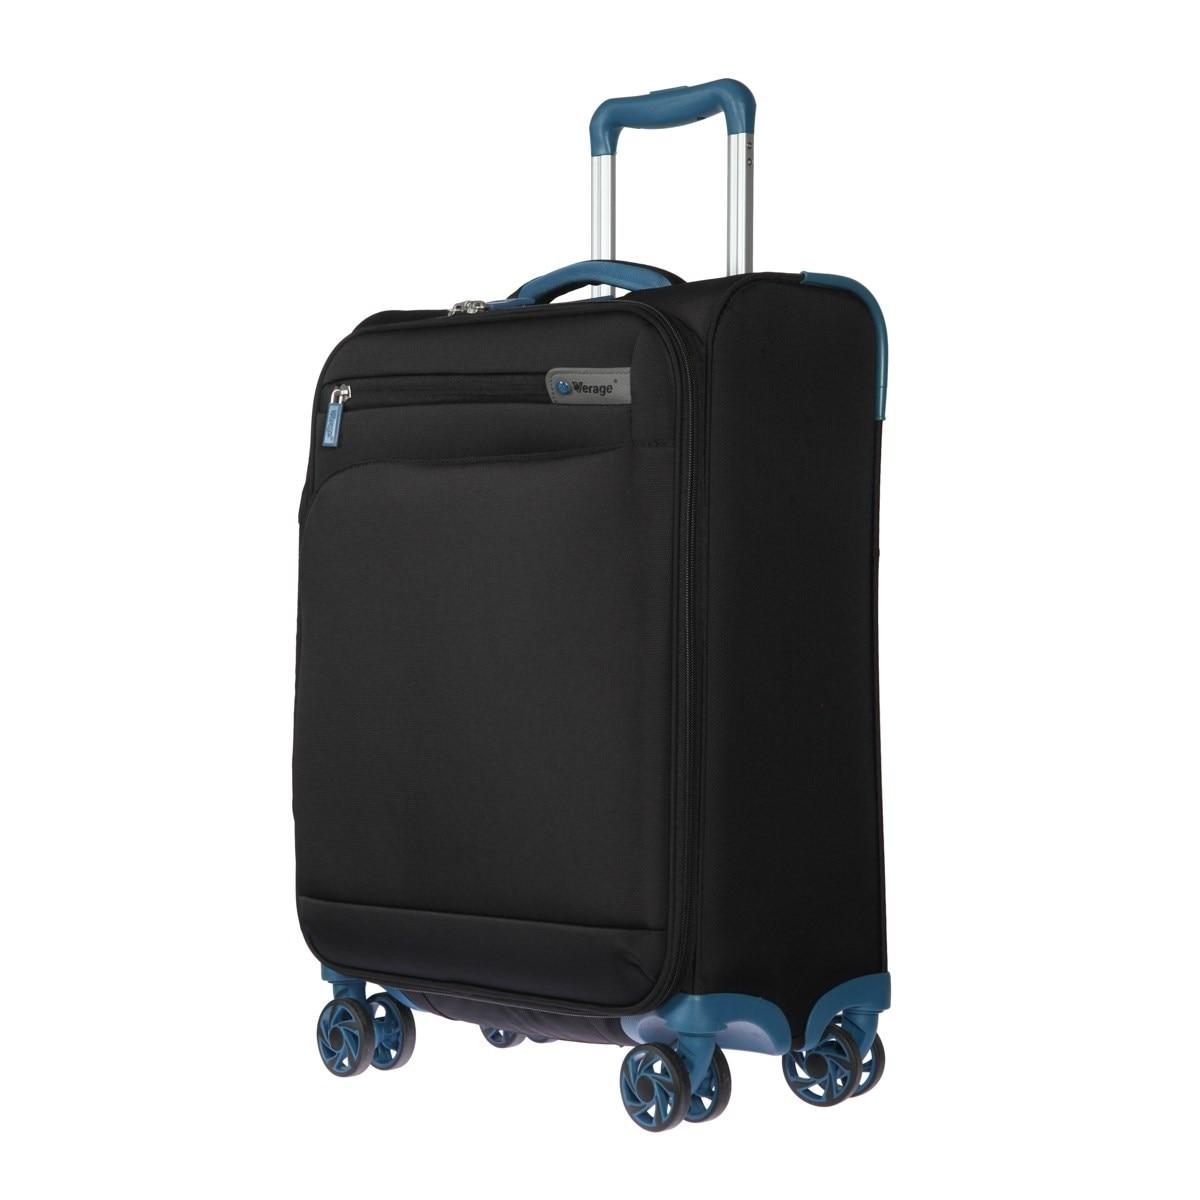 Suitcase-trolley Verage GM17016W20 black